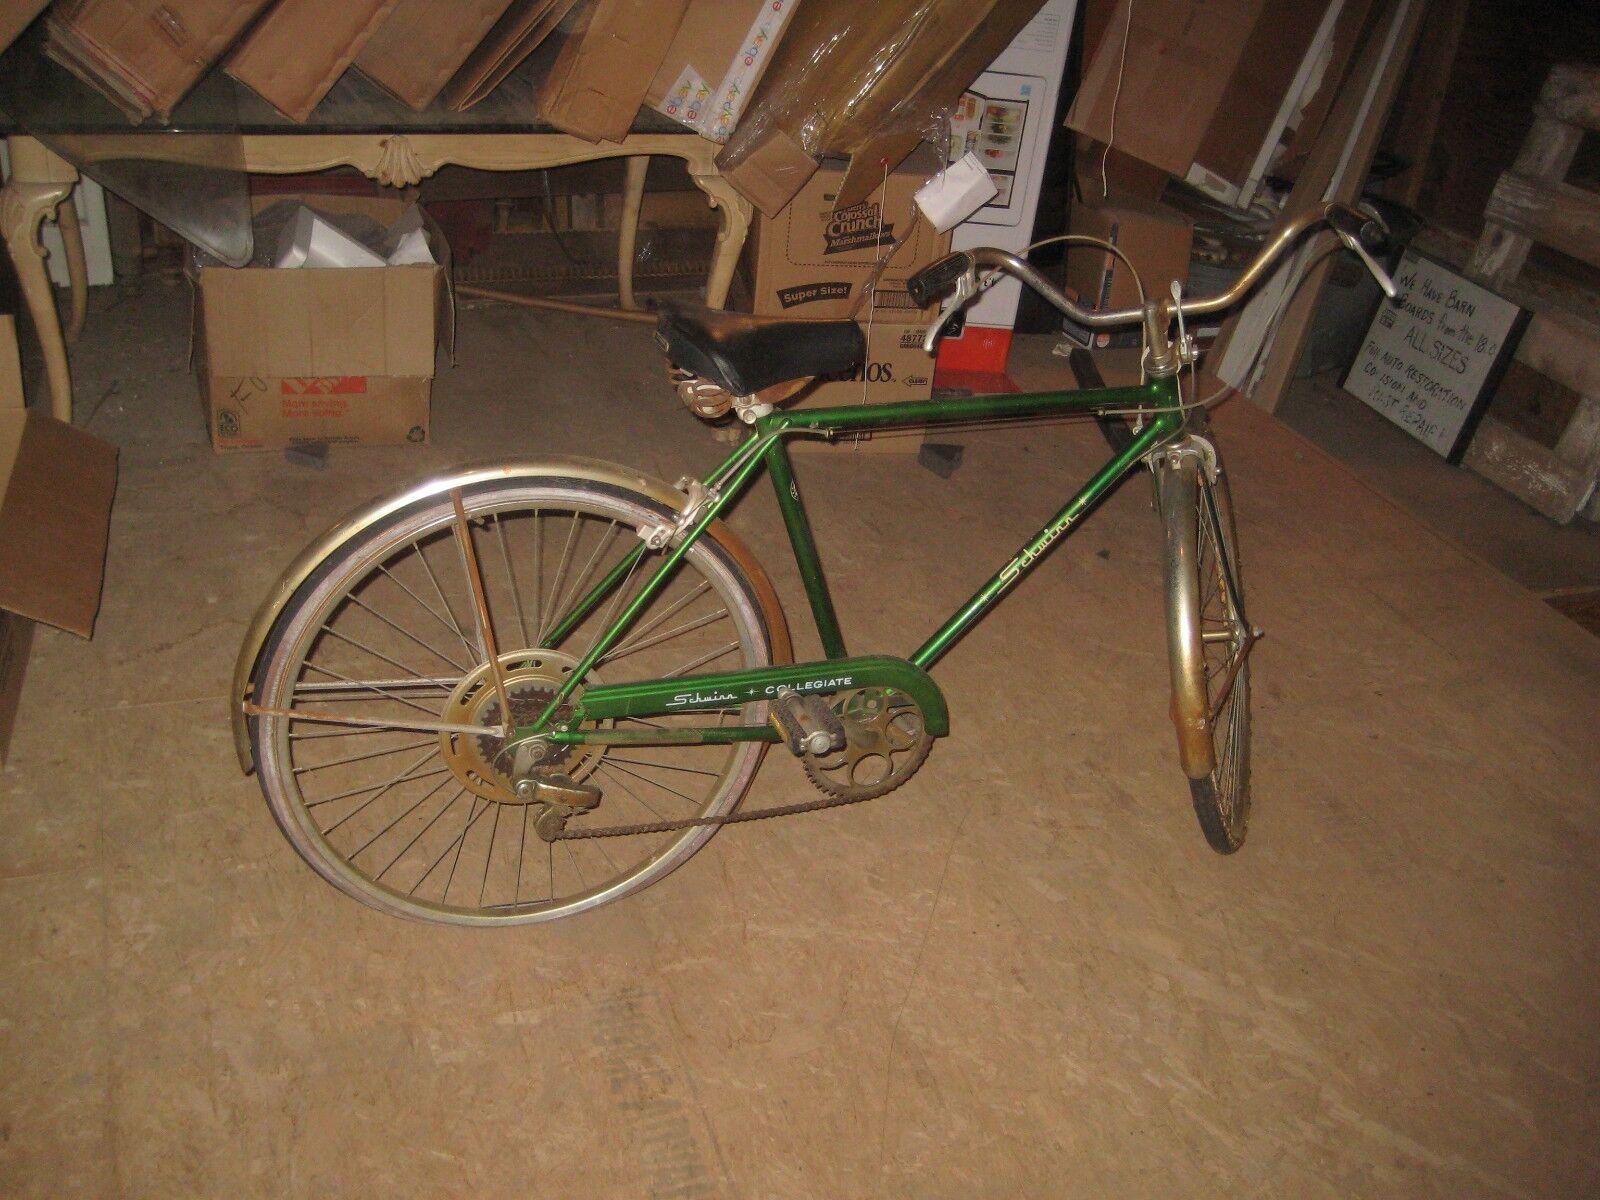 1960 S Schwinn Collegiate 5 Speed Vintage  Bike Men's Bicycle Antique  ORIGINAL  buy 100% authentic quality